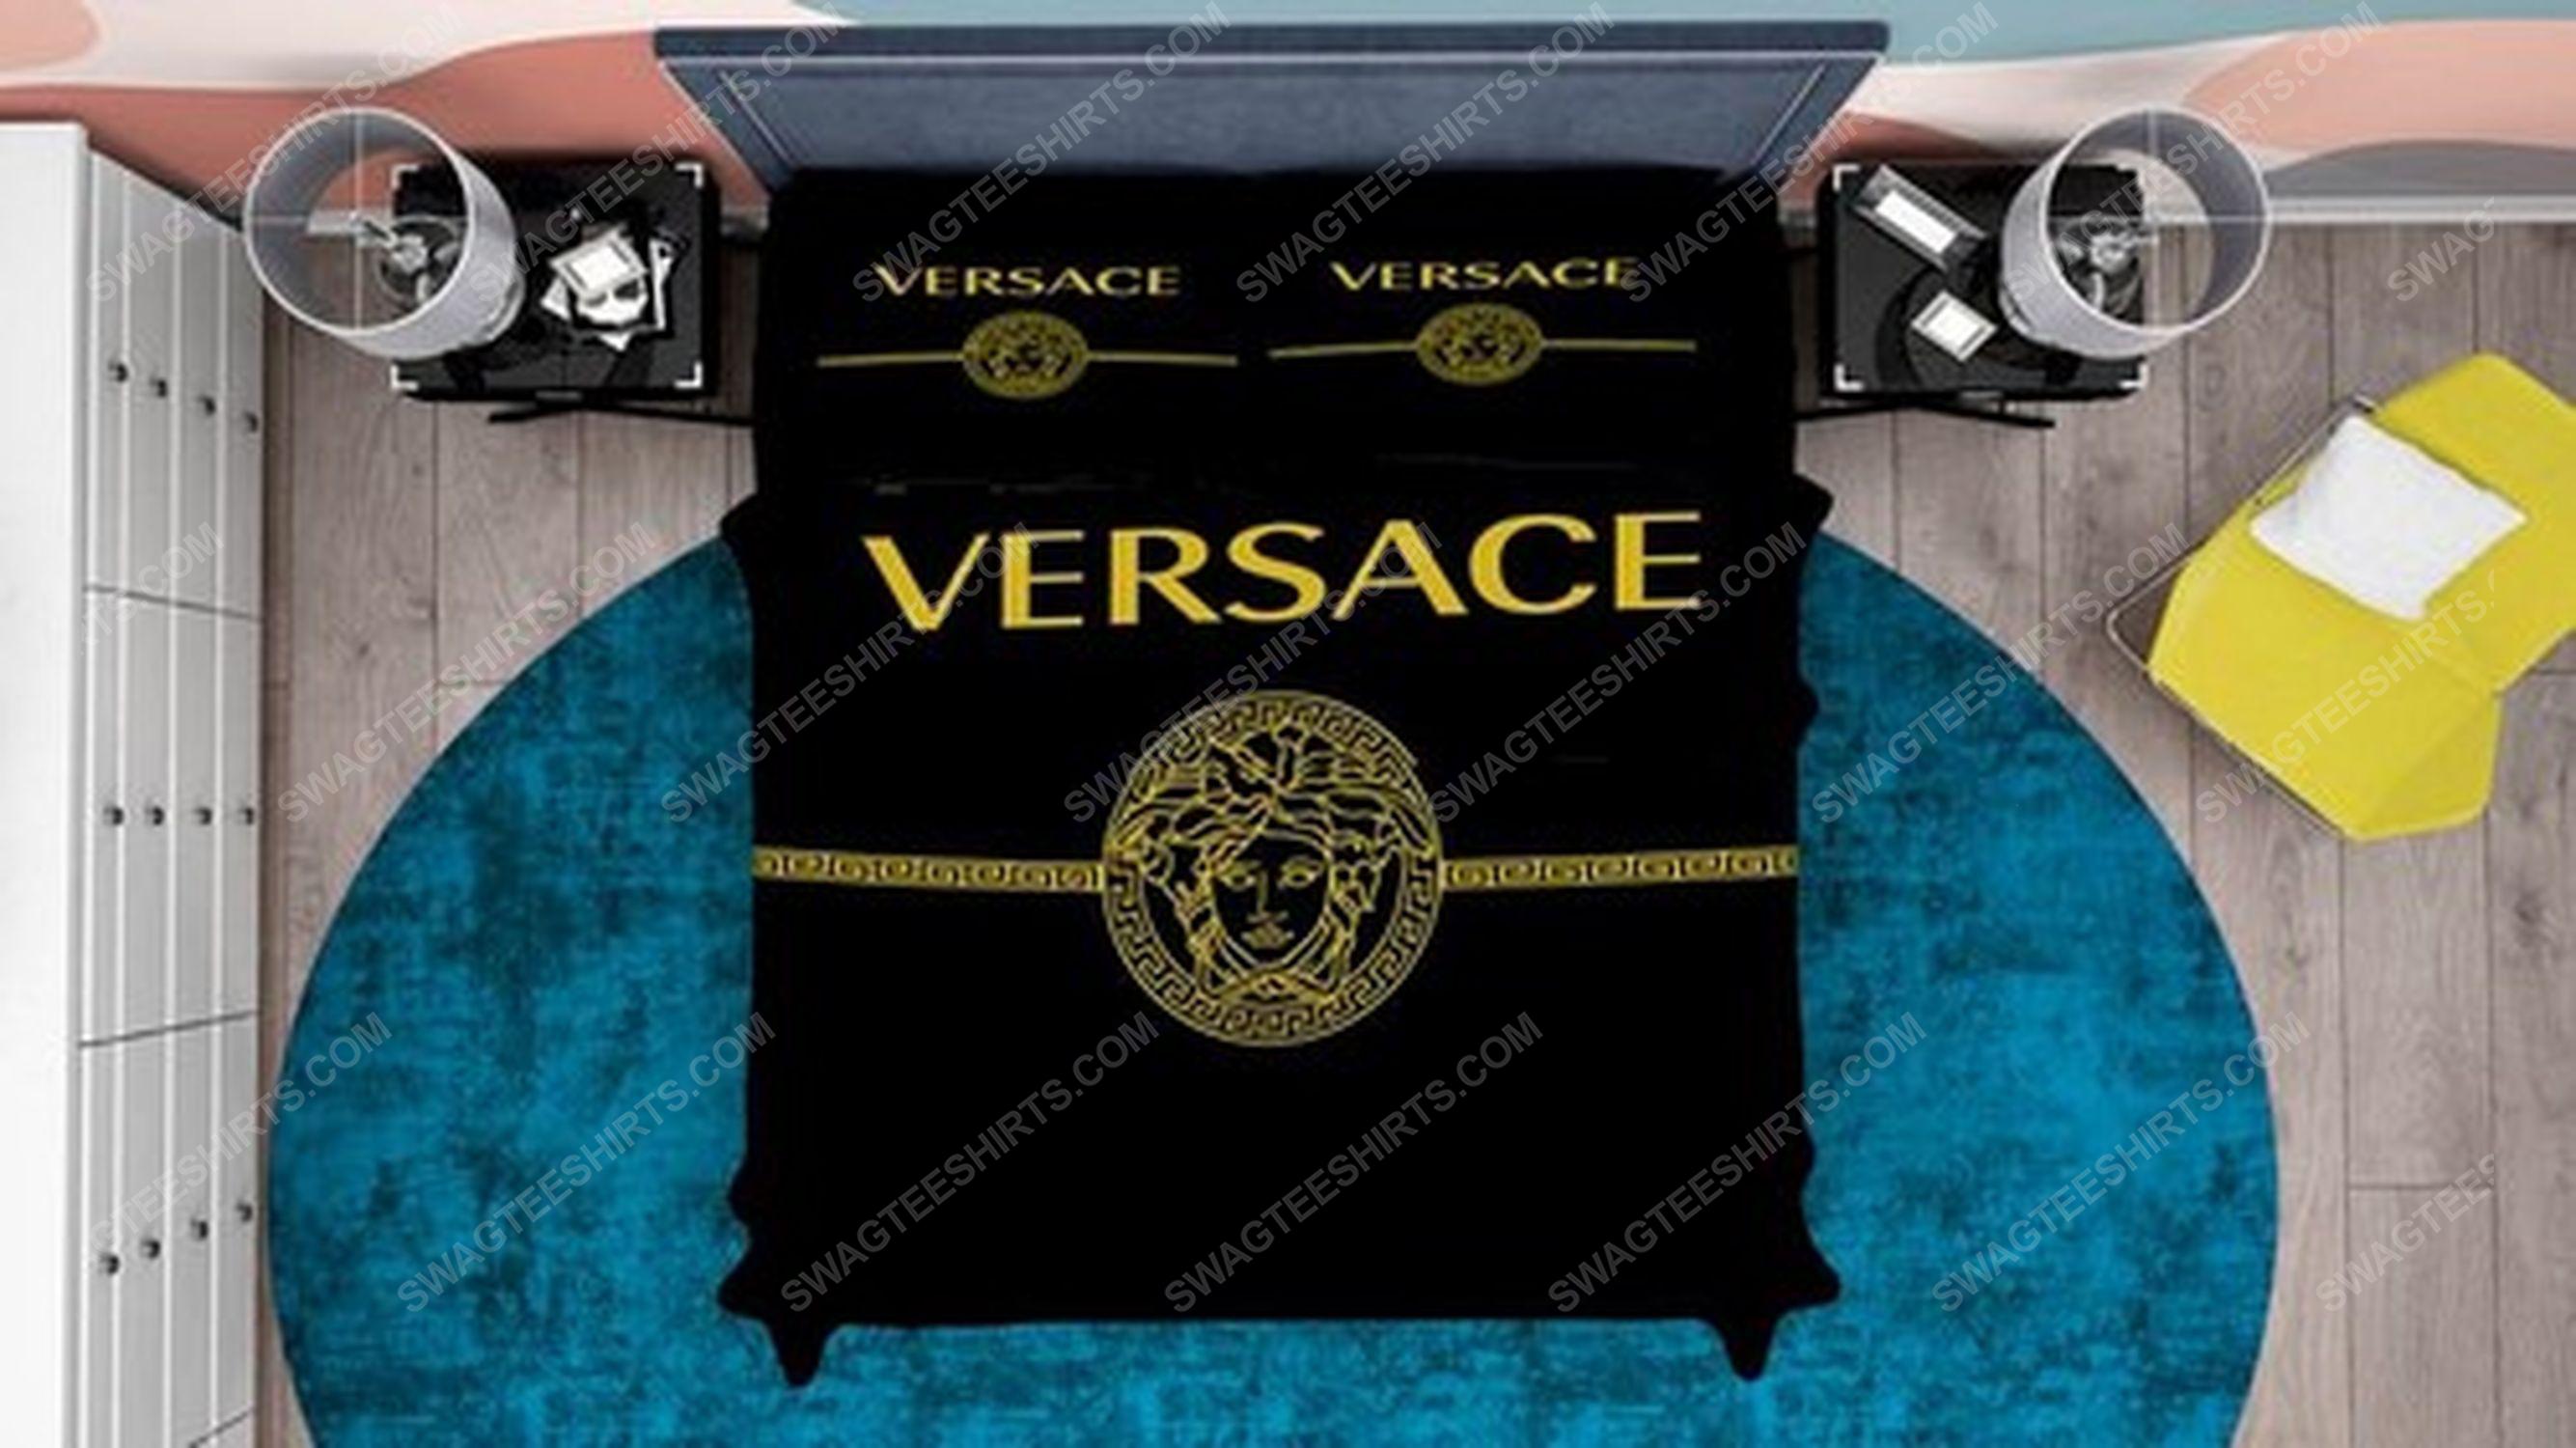 Versace black and gold full print duvet cover bedding set 2 - Copy